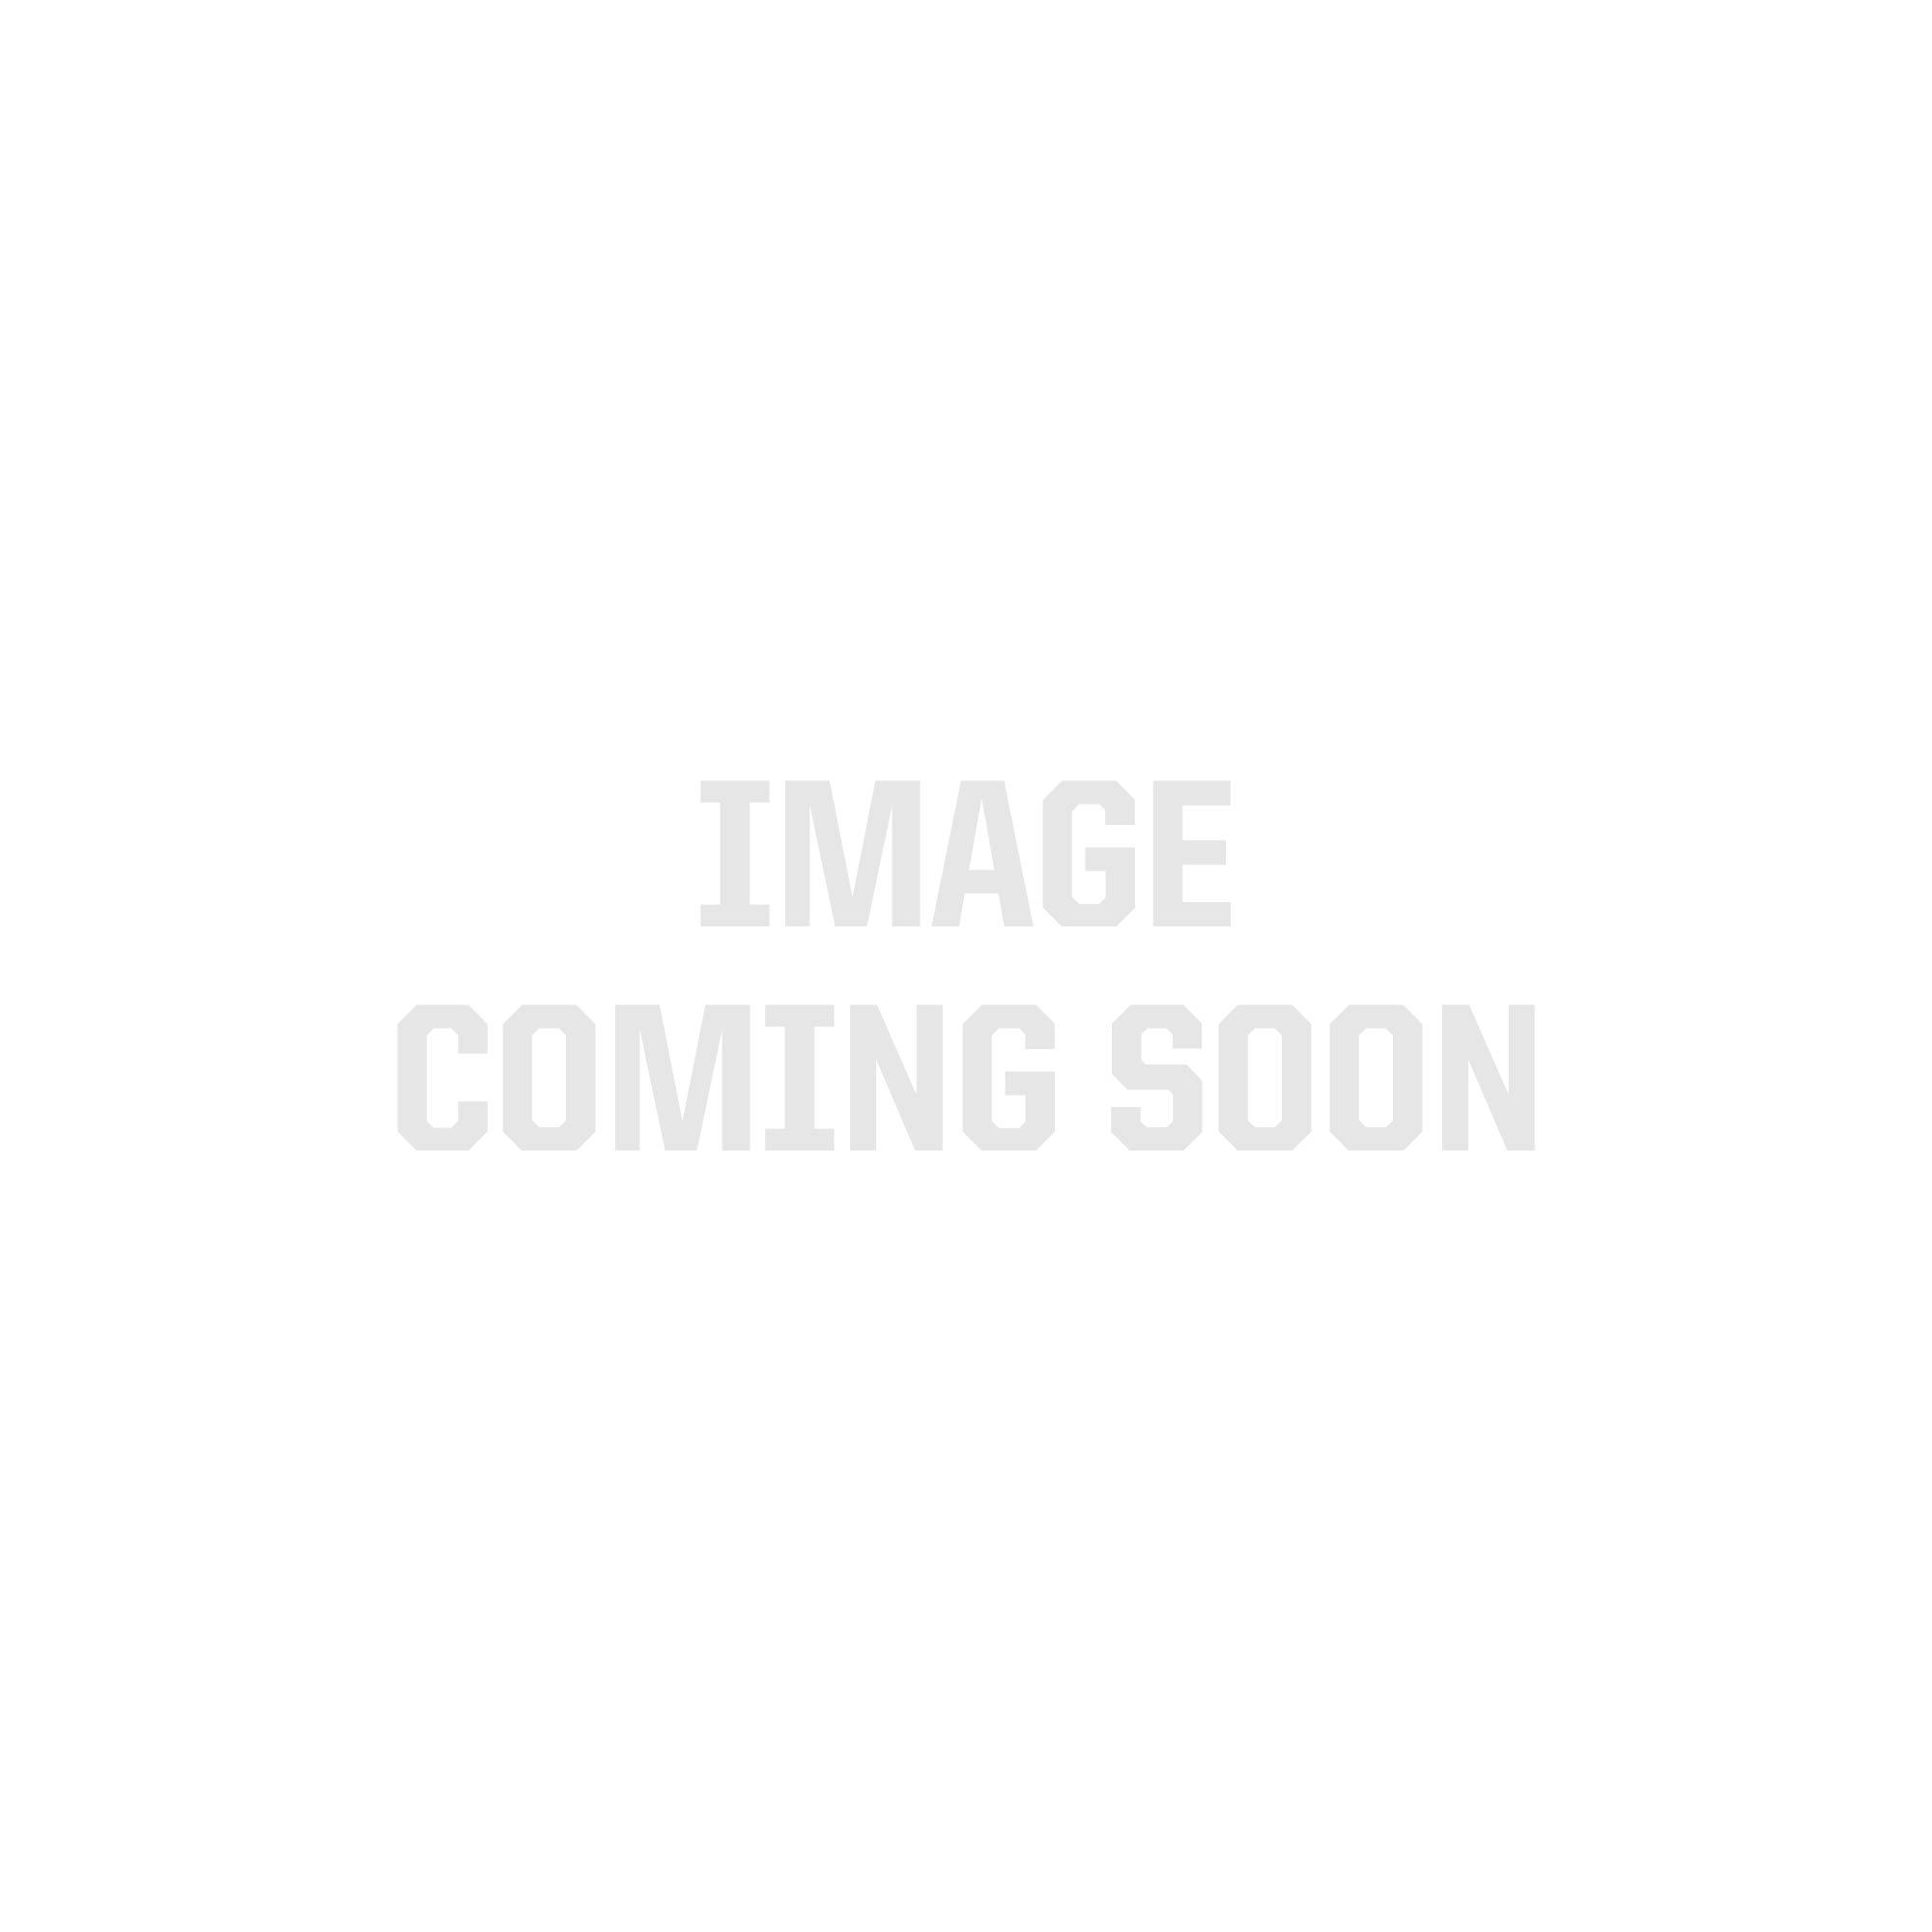 Mil-Tec Tactical Side Zip Botas Khaki tamaño 7 UK / 8 US QtzG8hsqj